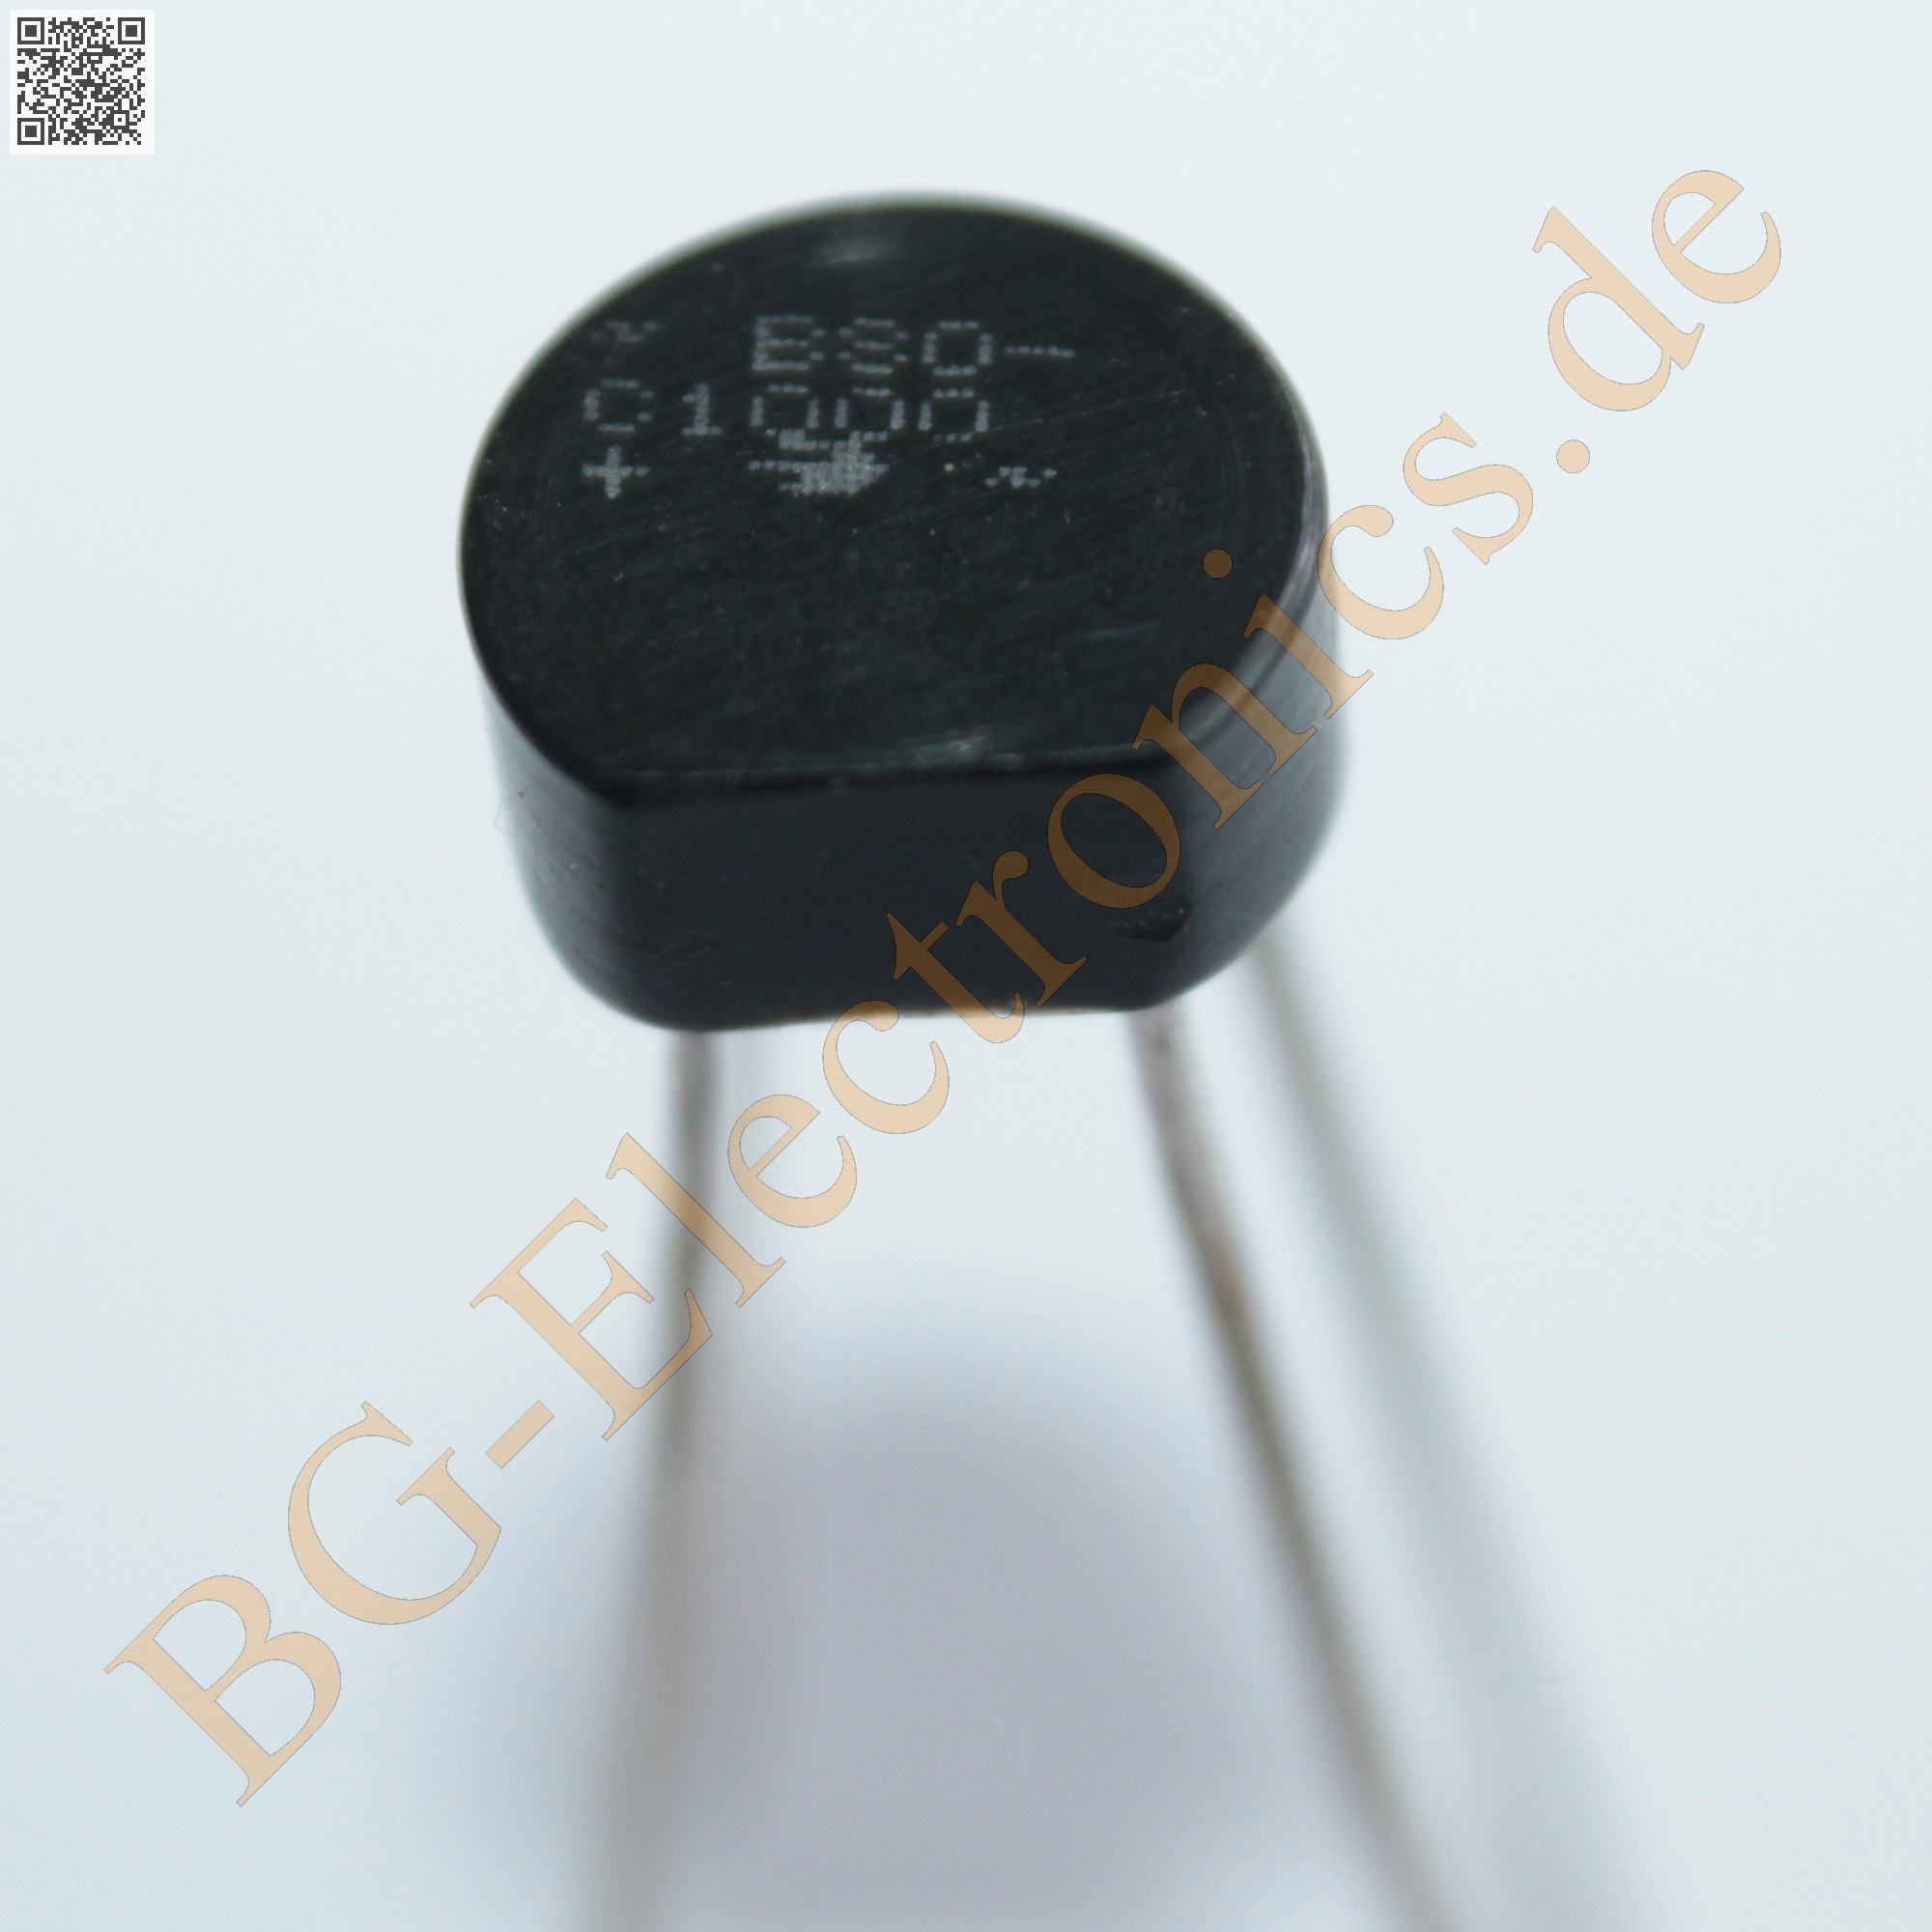 5 x b80c1000 br ckengleichrichter 5pcs ebay. Black Bedroom Furniture Sets. Home Design Ideas